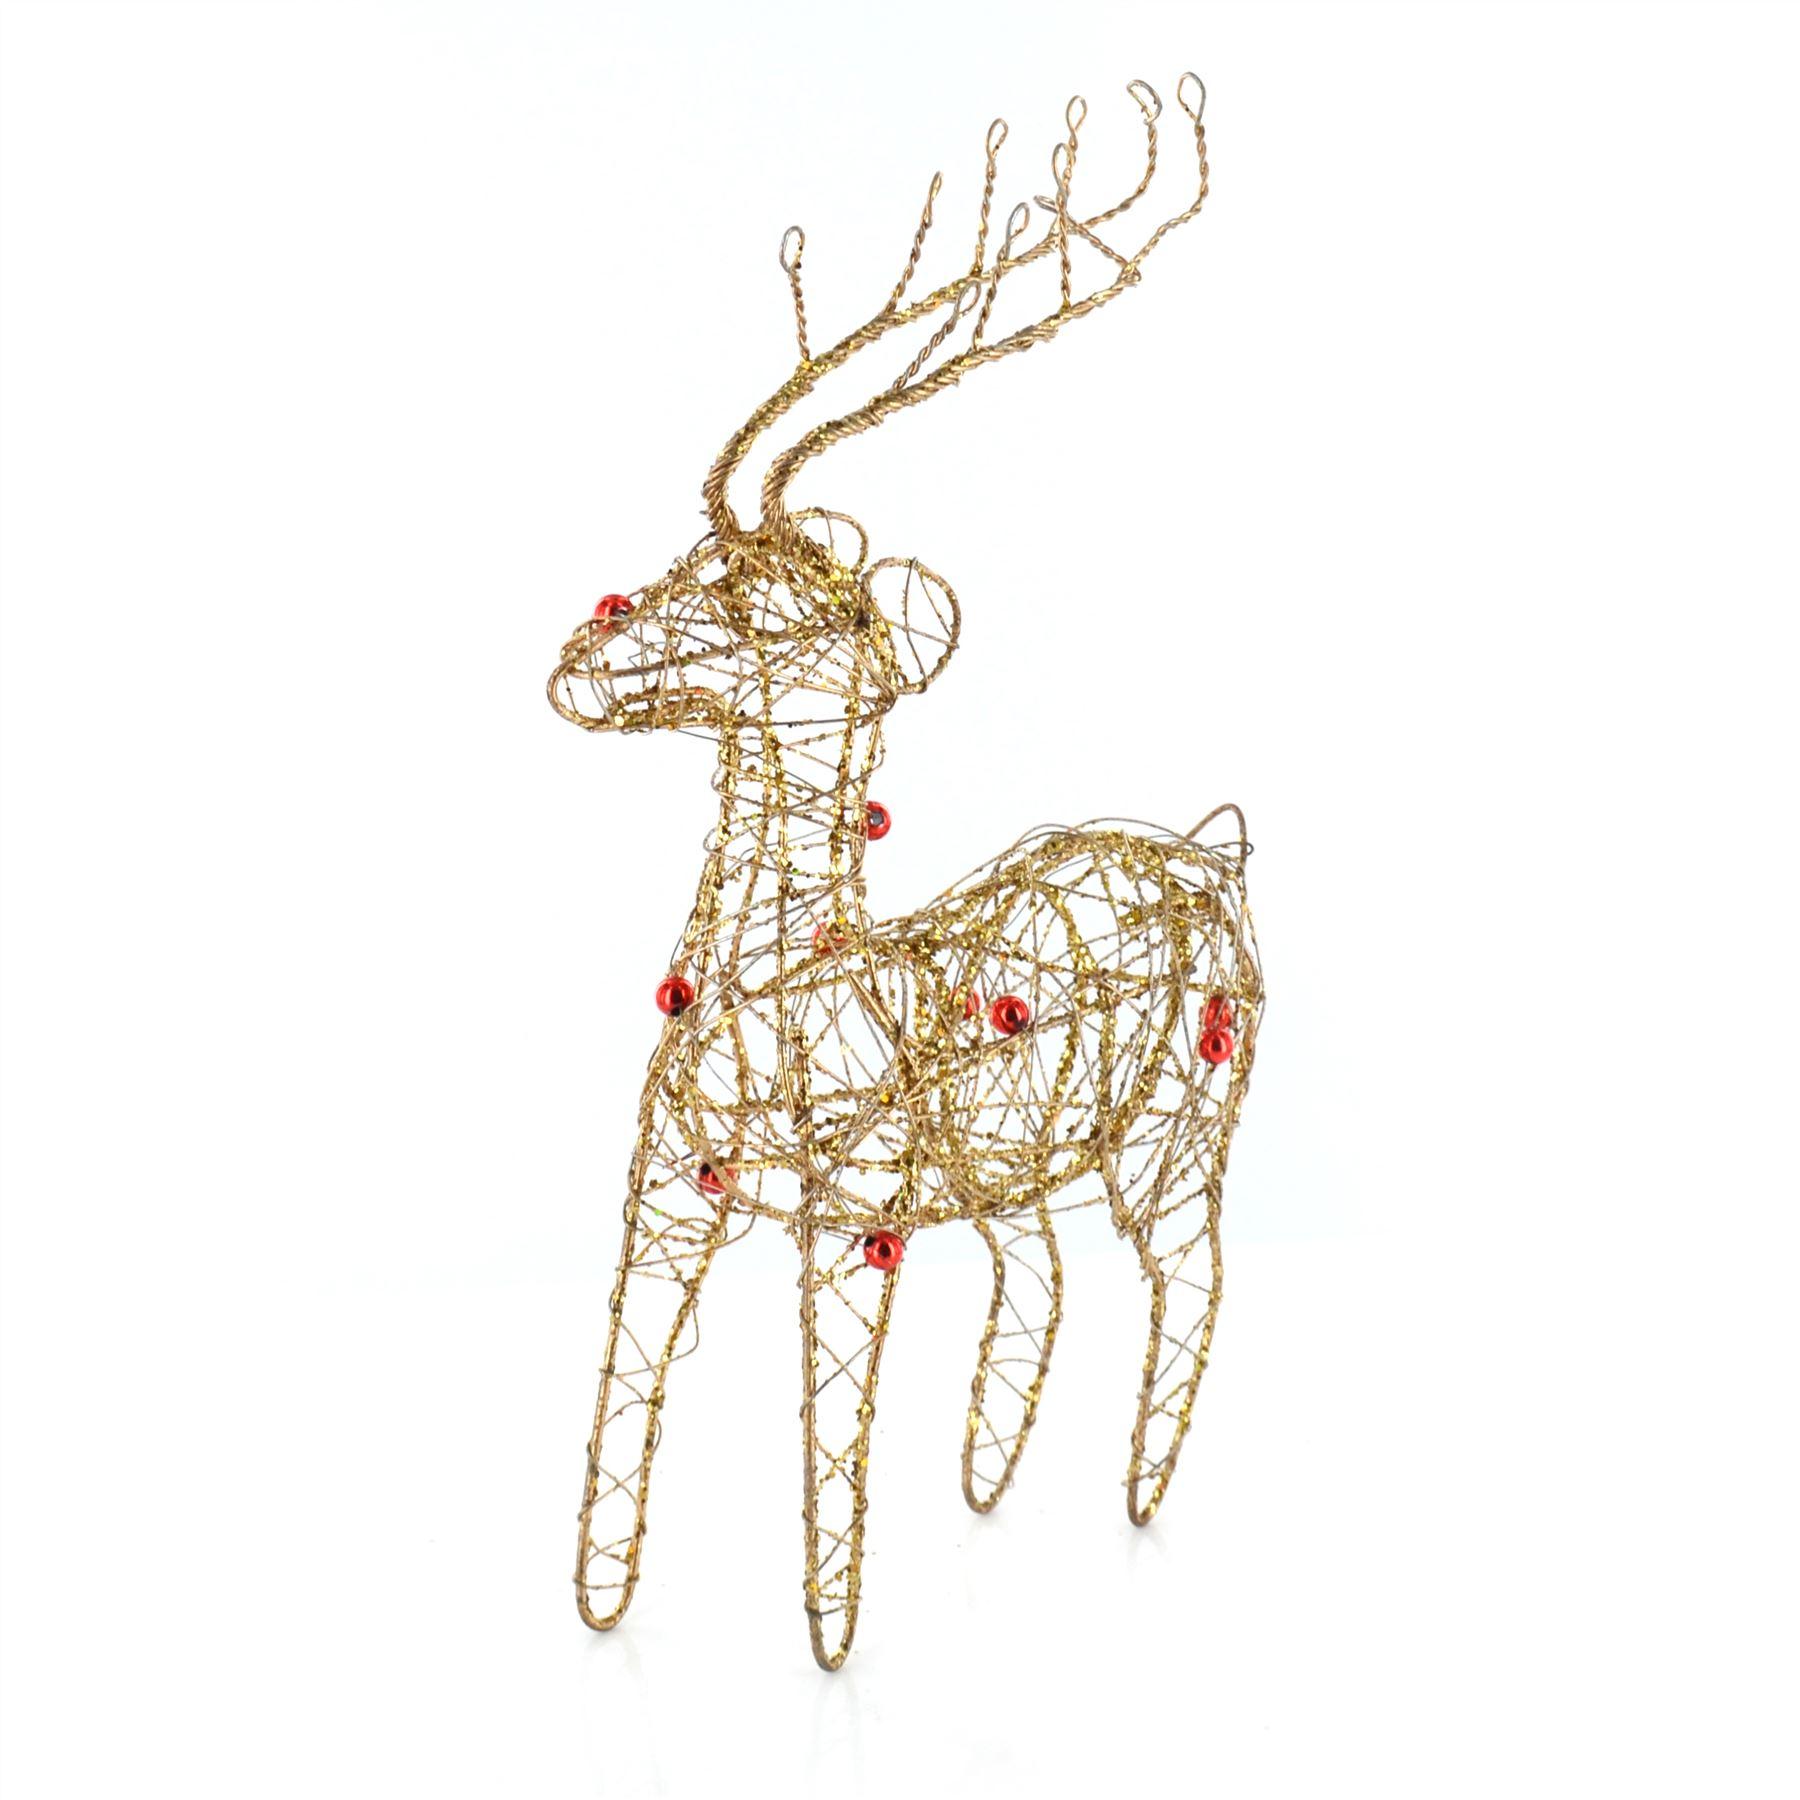 New Glitter Wire Christmas Reindeer Decoration Sparkle ...